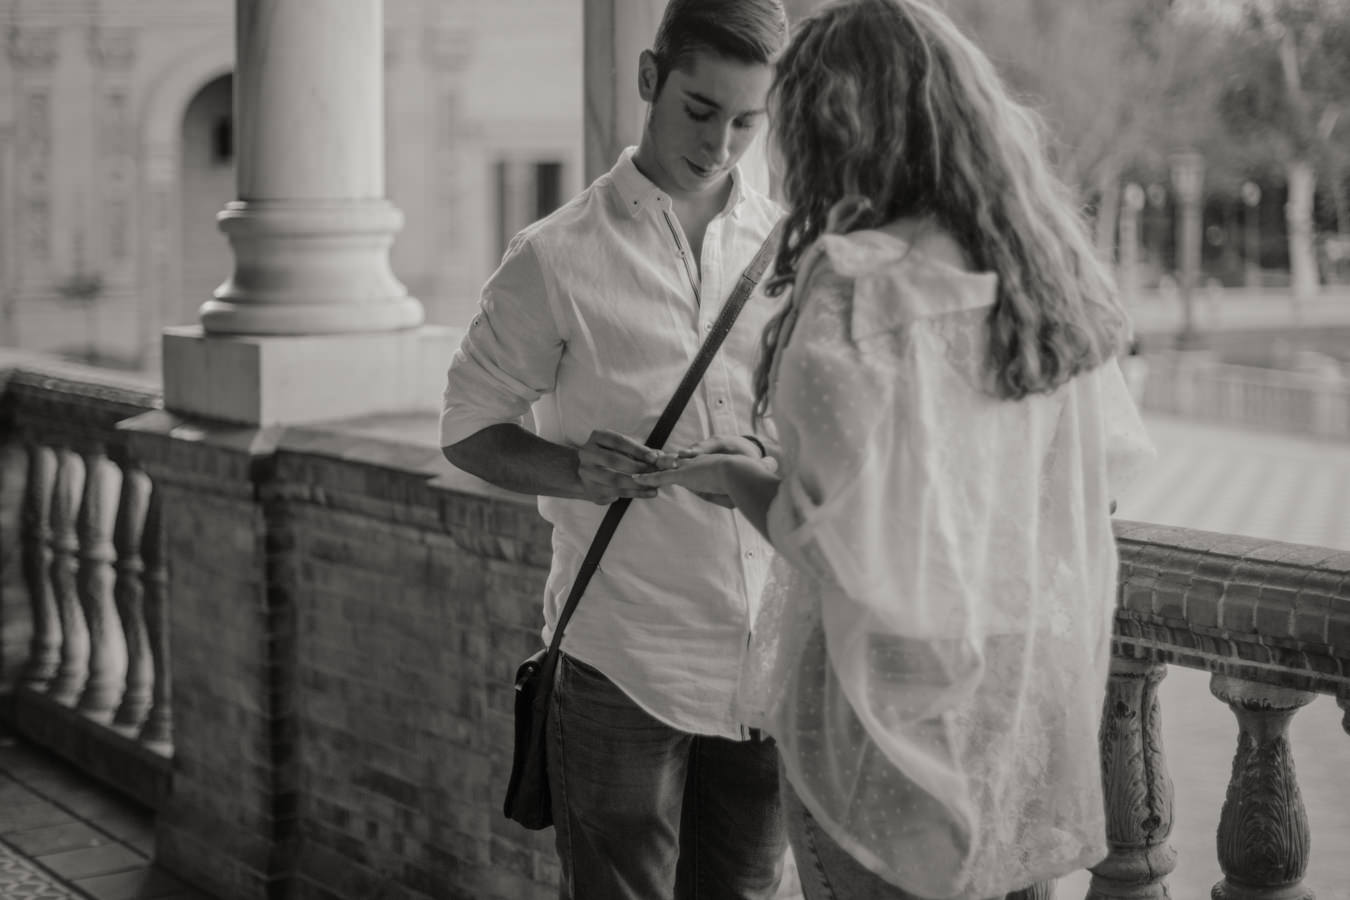 dónde pedir la mano en sevilla? Plaza de España, Sevilla